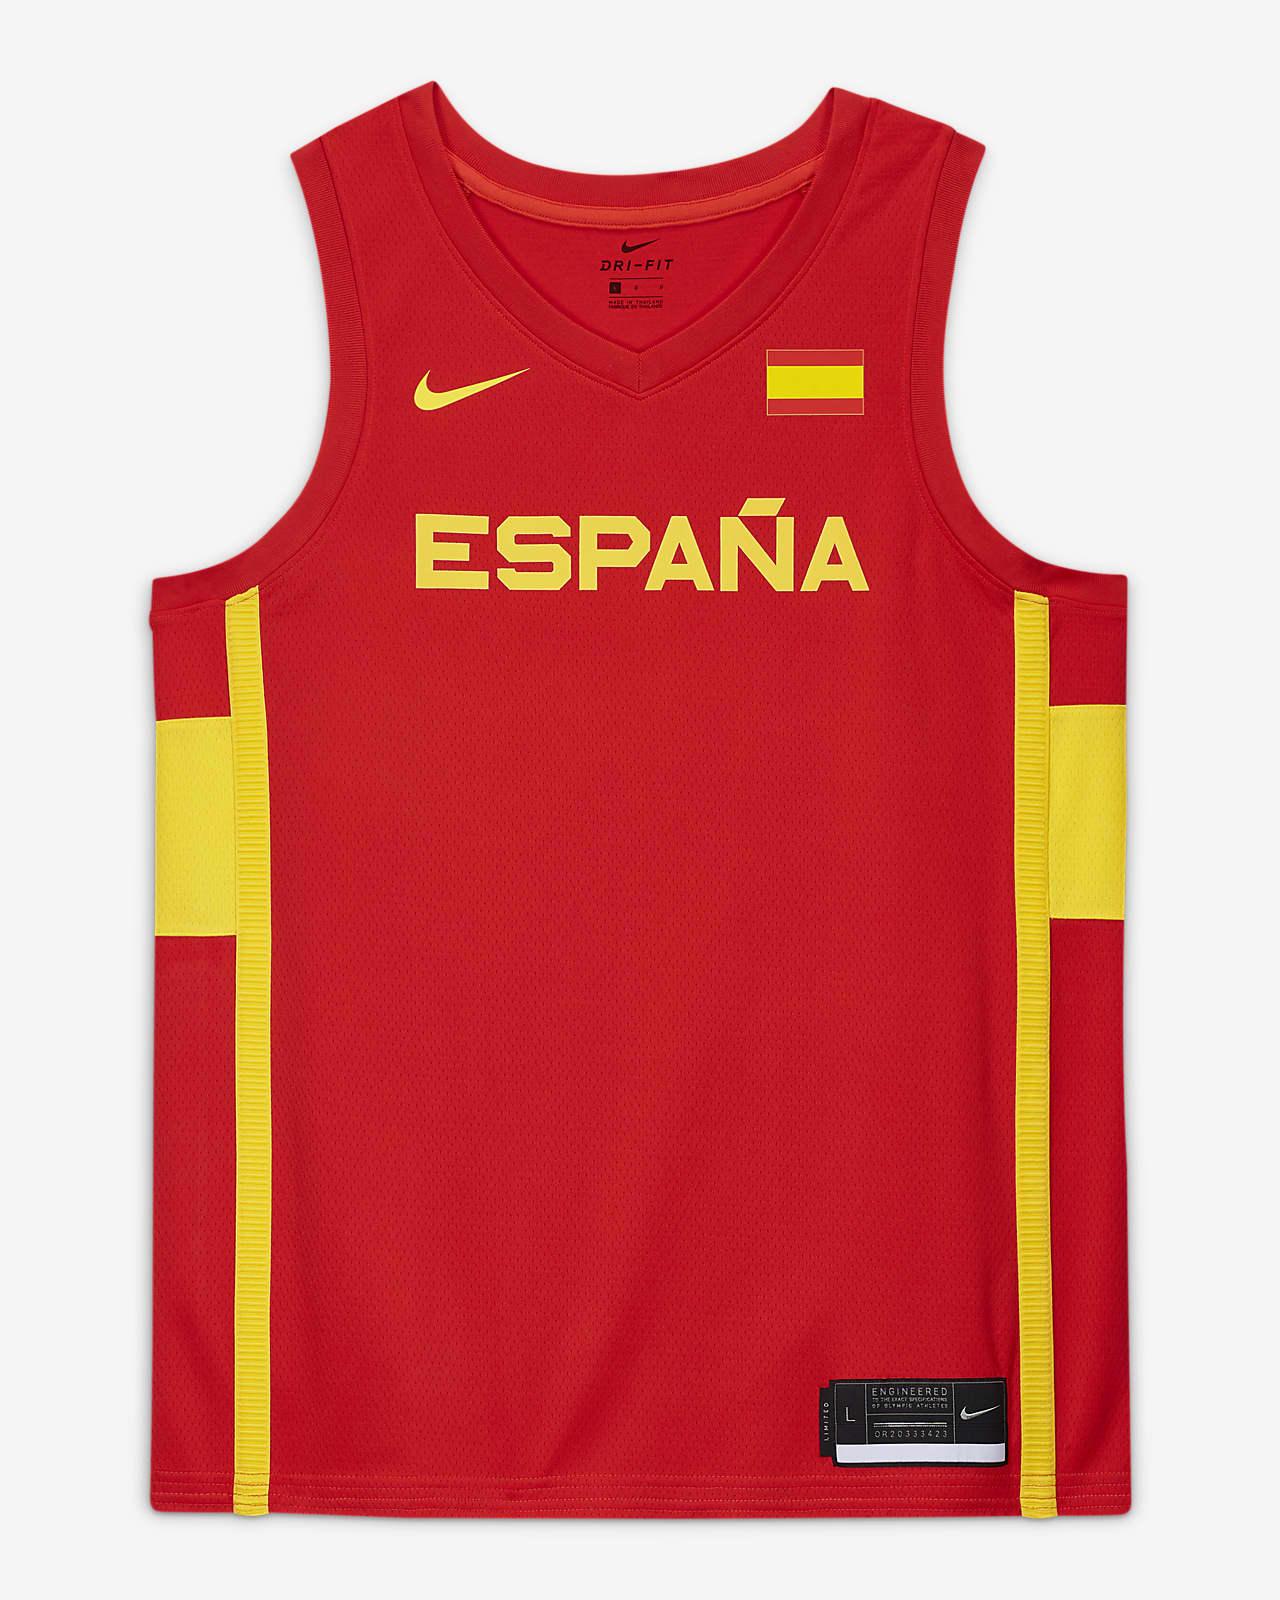 Spain Nike (Road) Limited Men's Nike Basketball Jersey